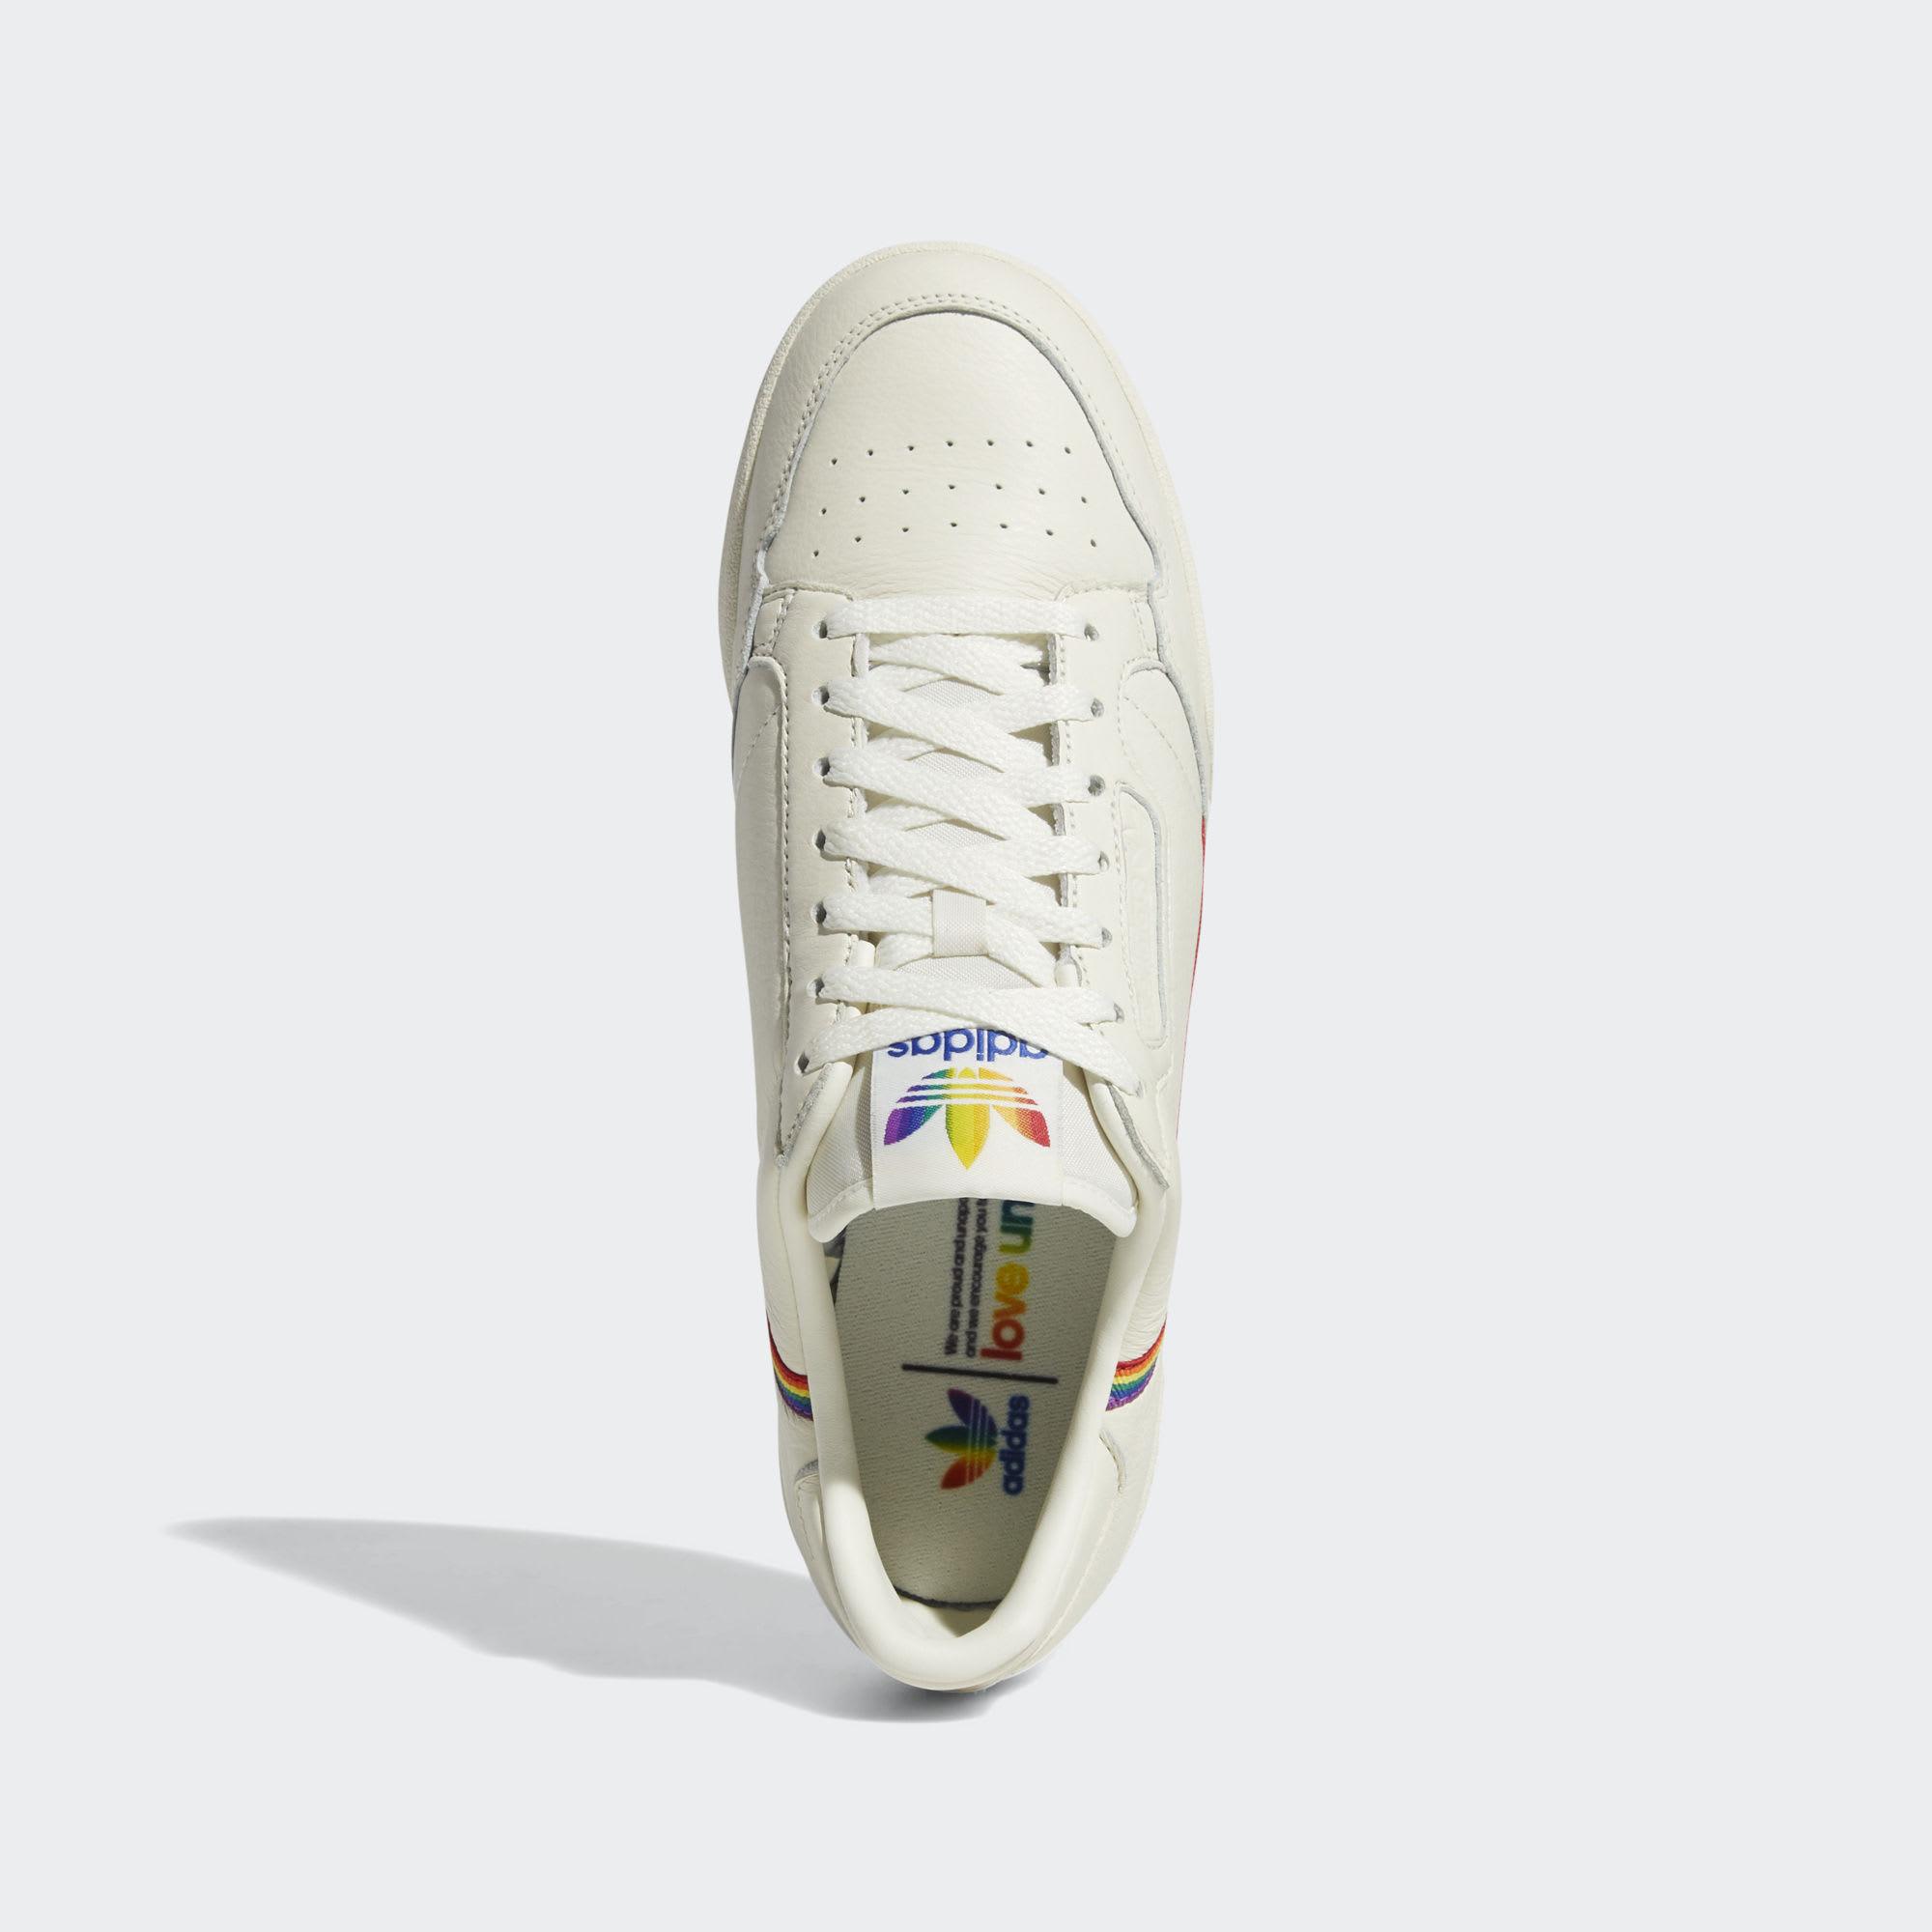 size 40 4a1bf a2d60 Image via Adidas Adidas Continental 80 'Pride' EF2318 (Top)